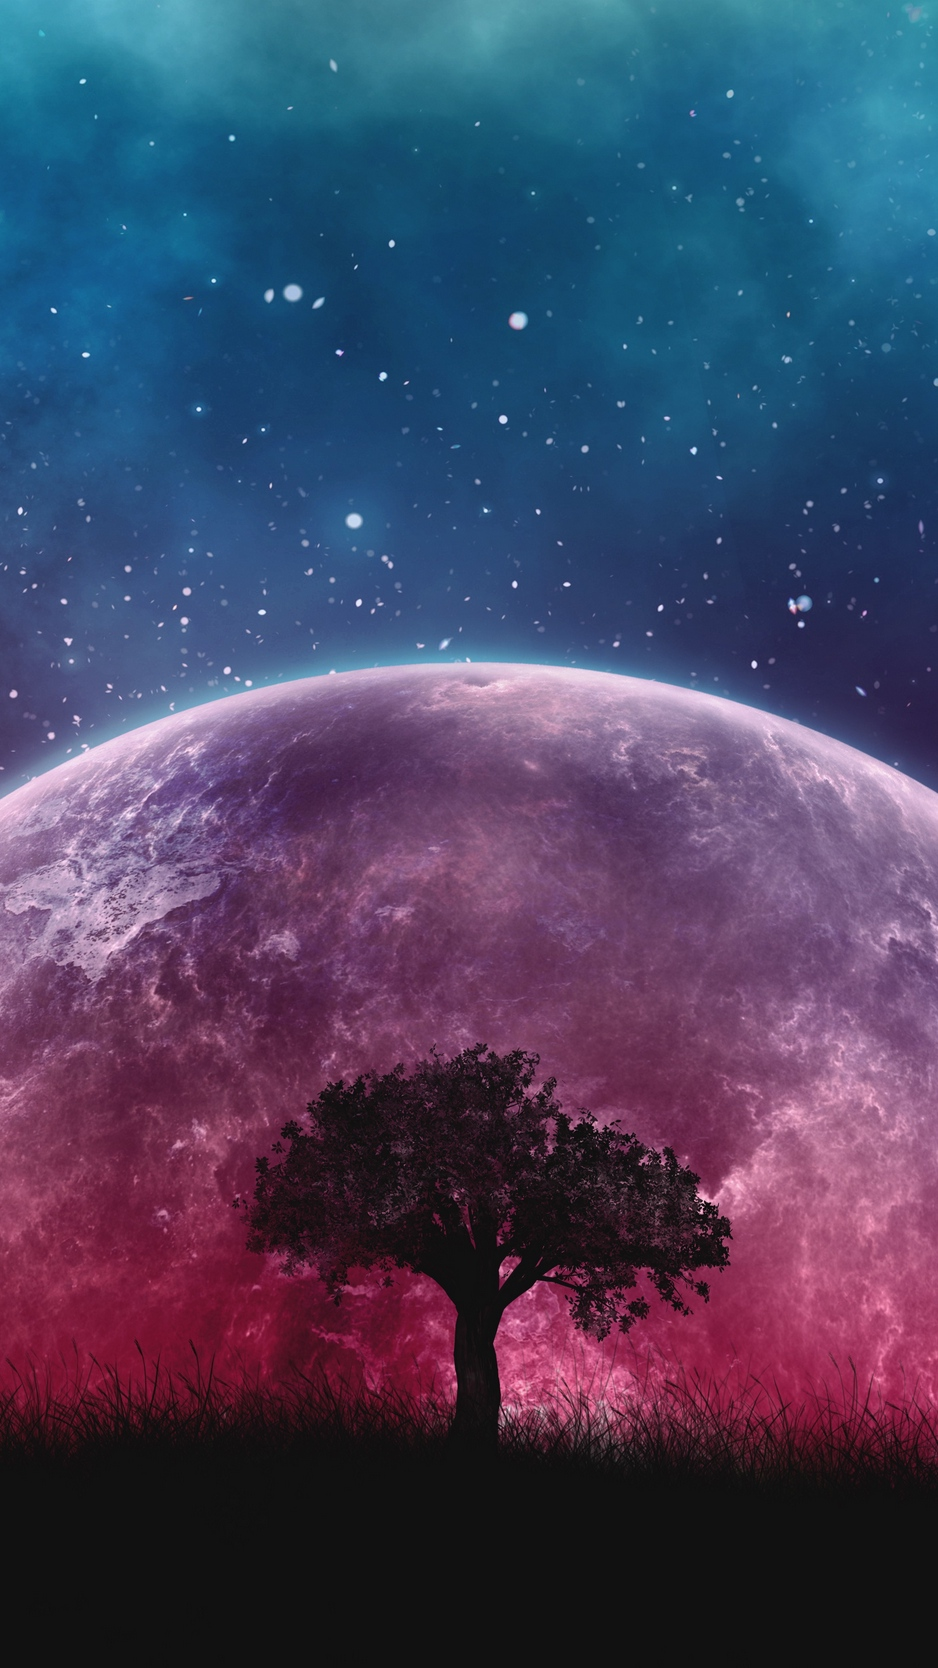 Free Download Download Wallpaper 938x1668 Tree Planet Stars